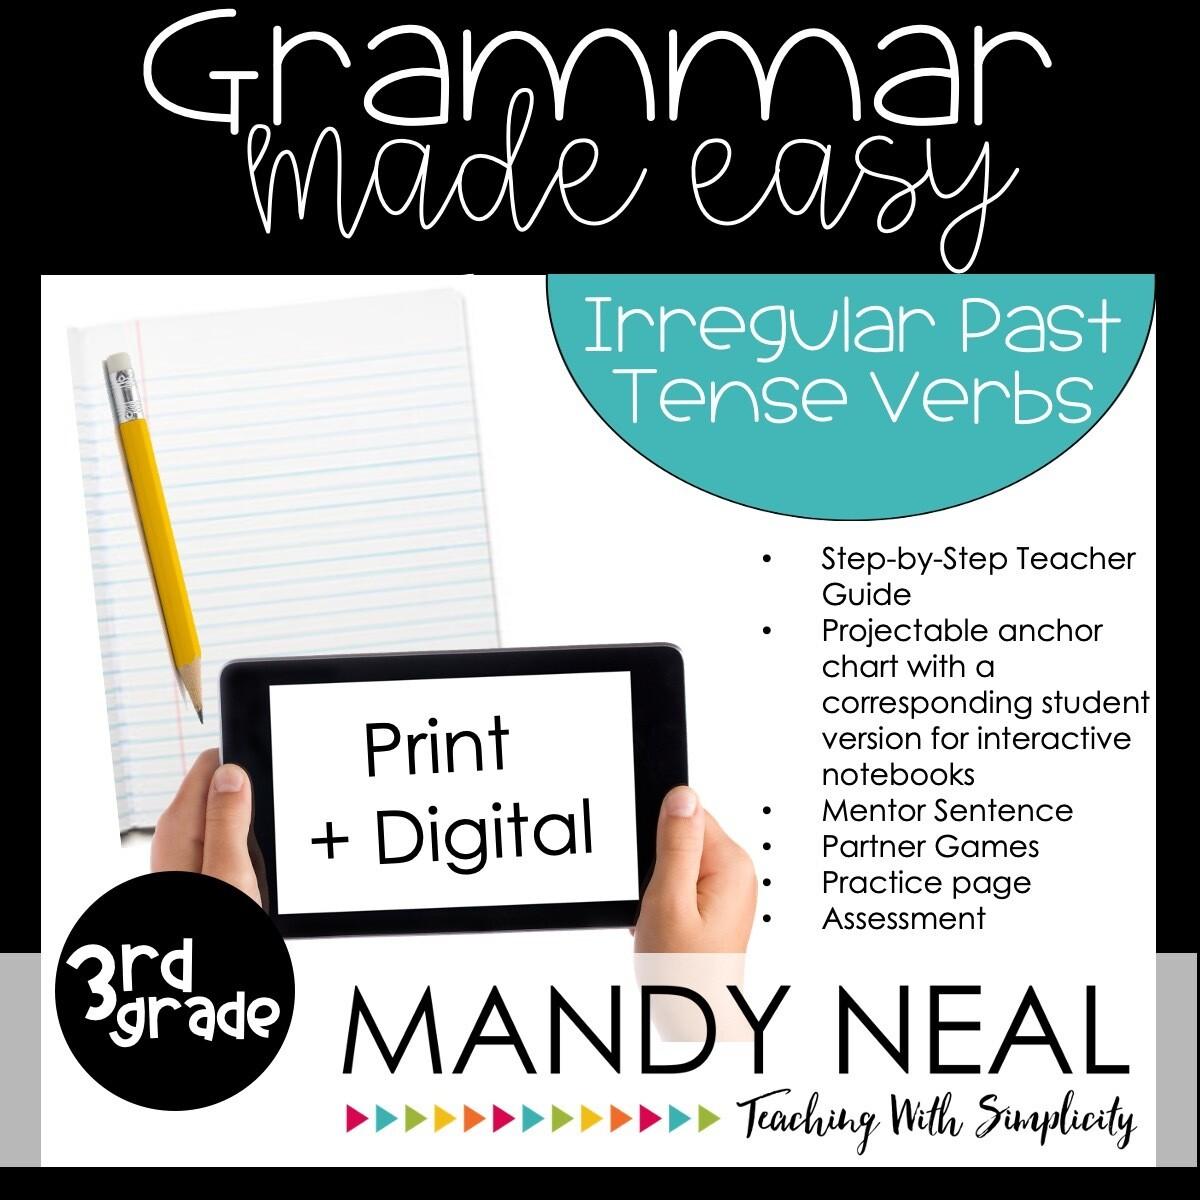 Print + Digital Third Grade Grammar Activities (Irregular Past Tense Verbs)